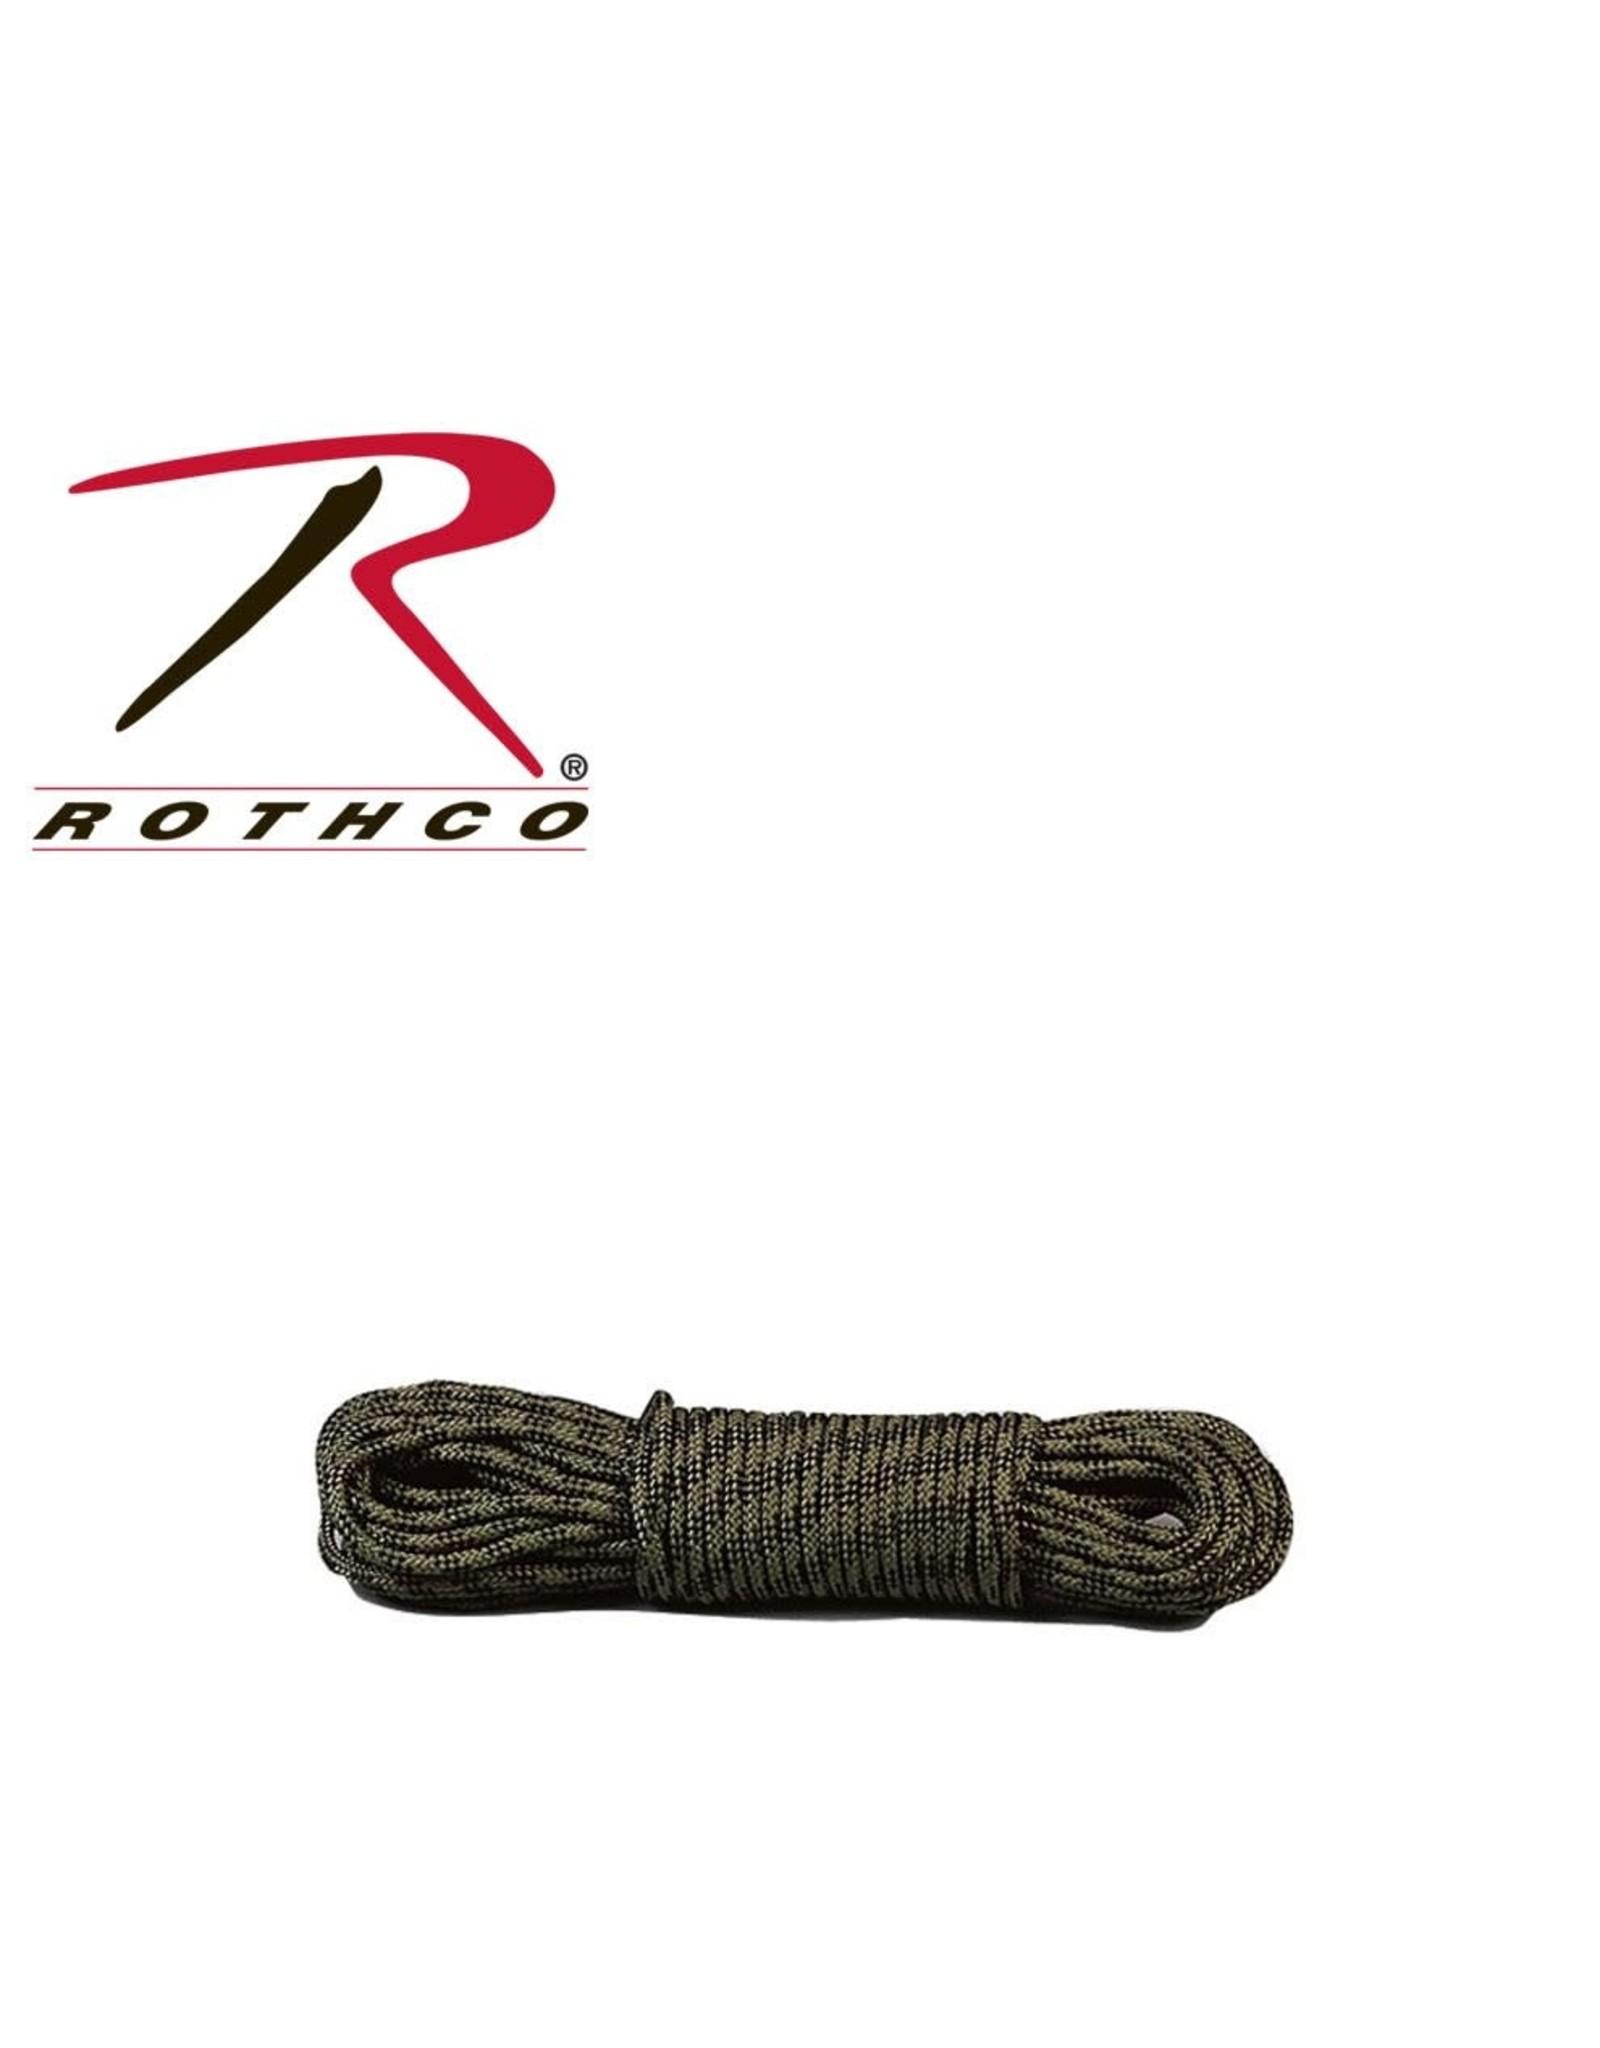 Gen Purpose Utility Rope